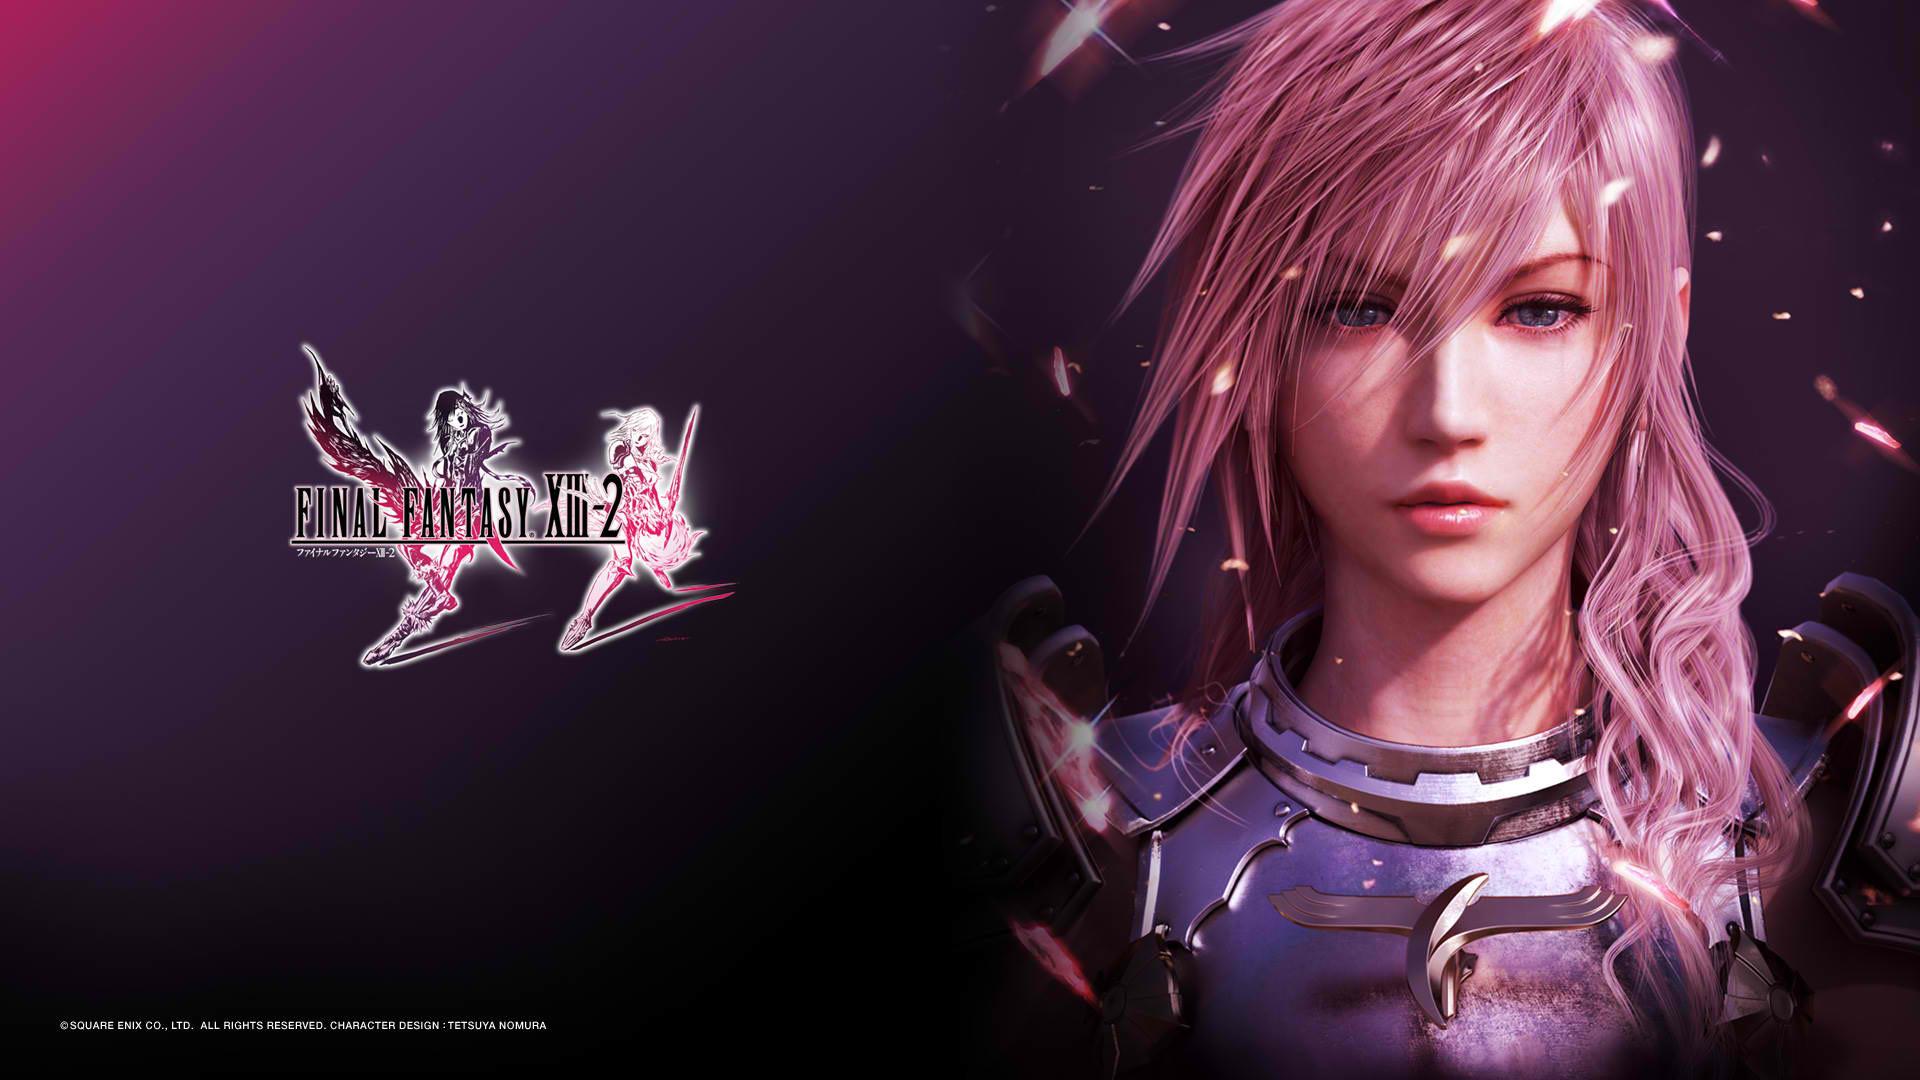 Final Fantasy Xiii 2 Wallpaper Hd wallpaper – 479363